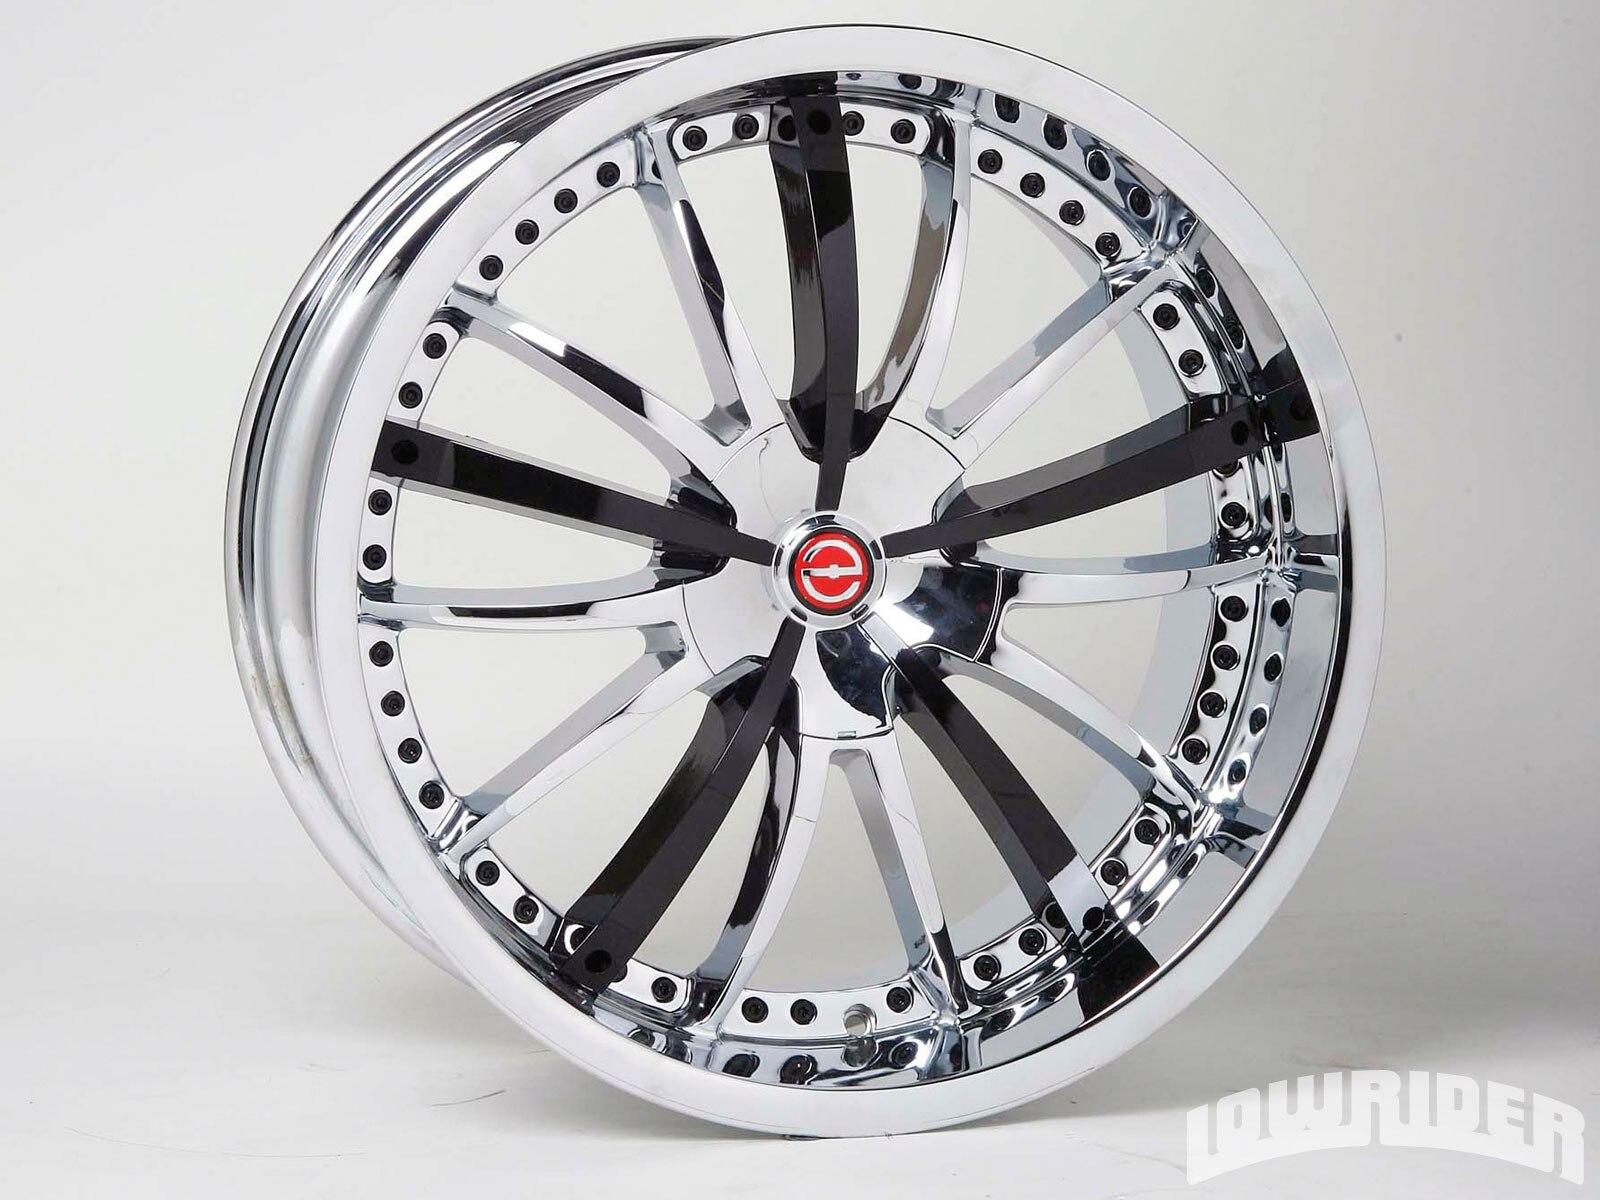 1103_lrmp_01_o-zoe_wheels_metal_rescue_digital_control_and_more-zoe_wheel2